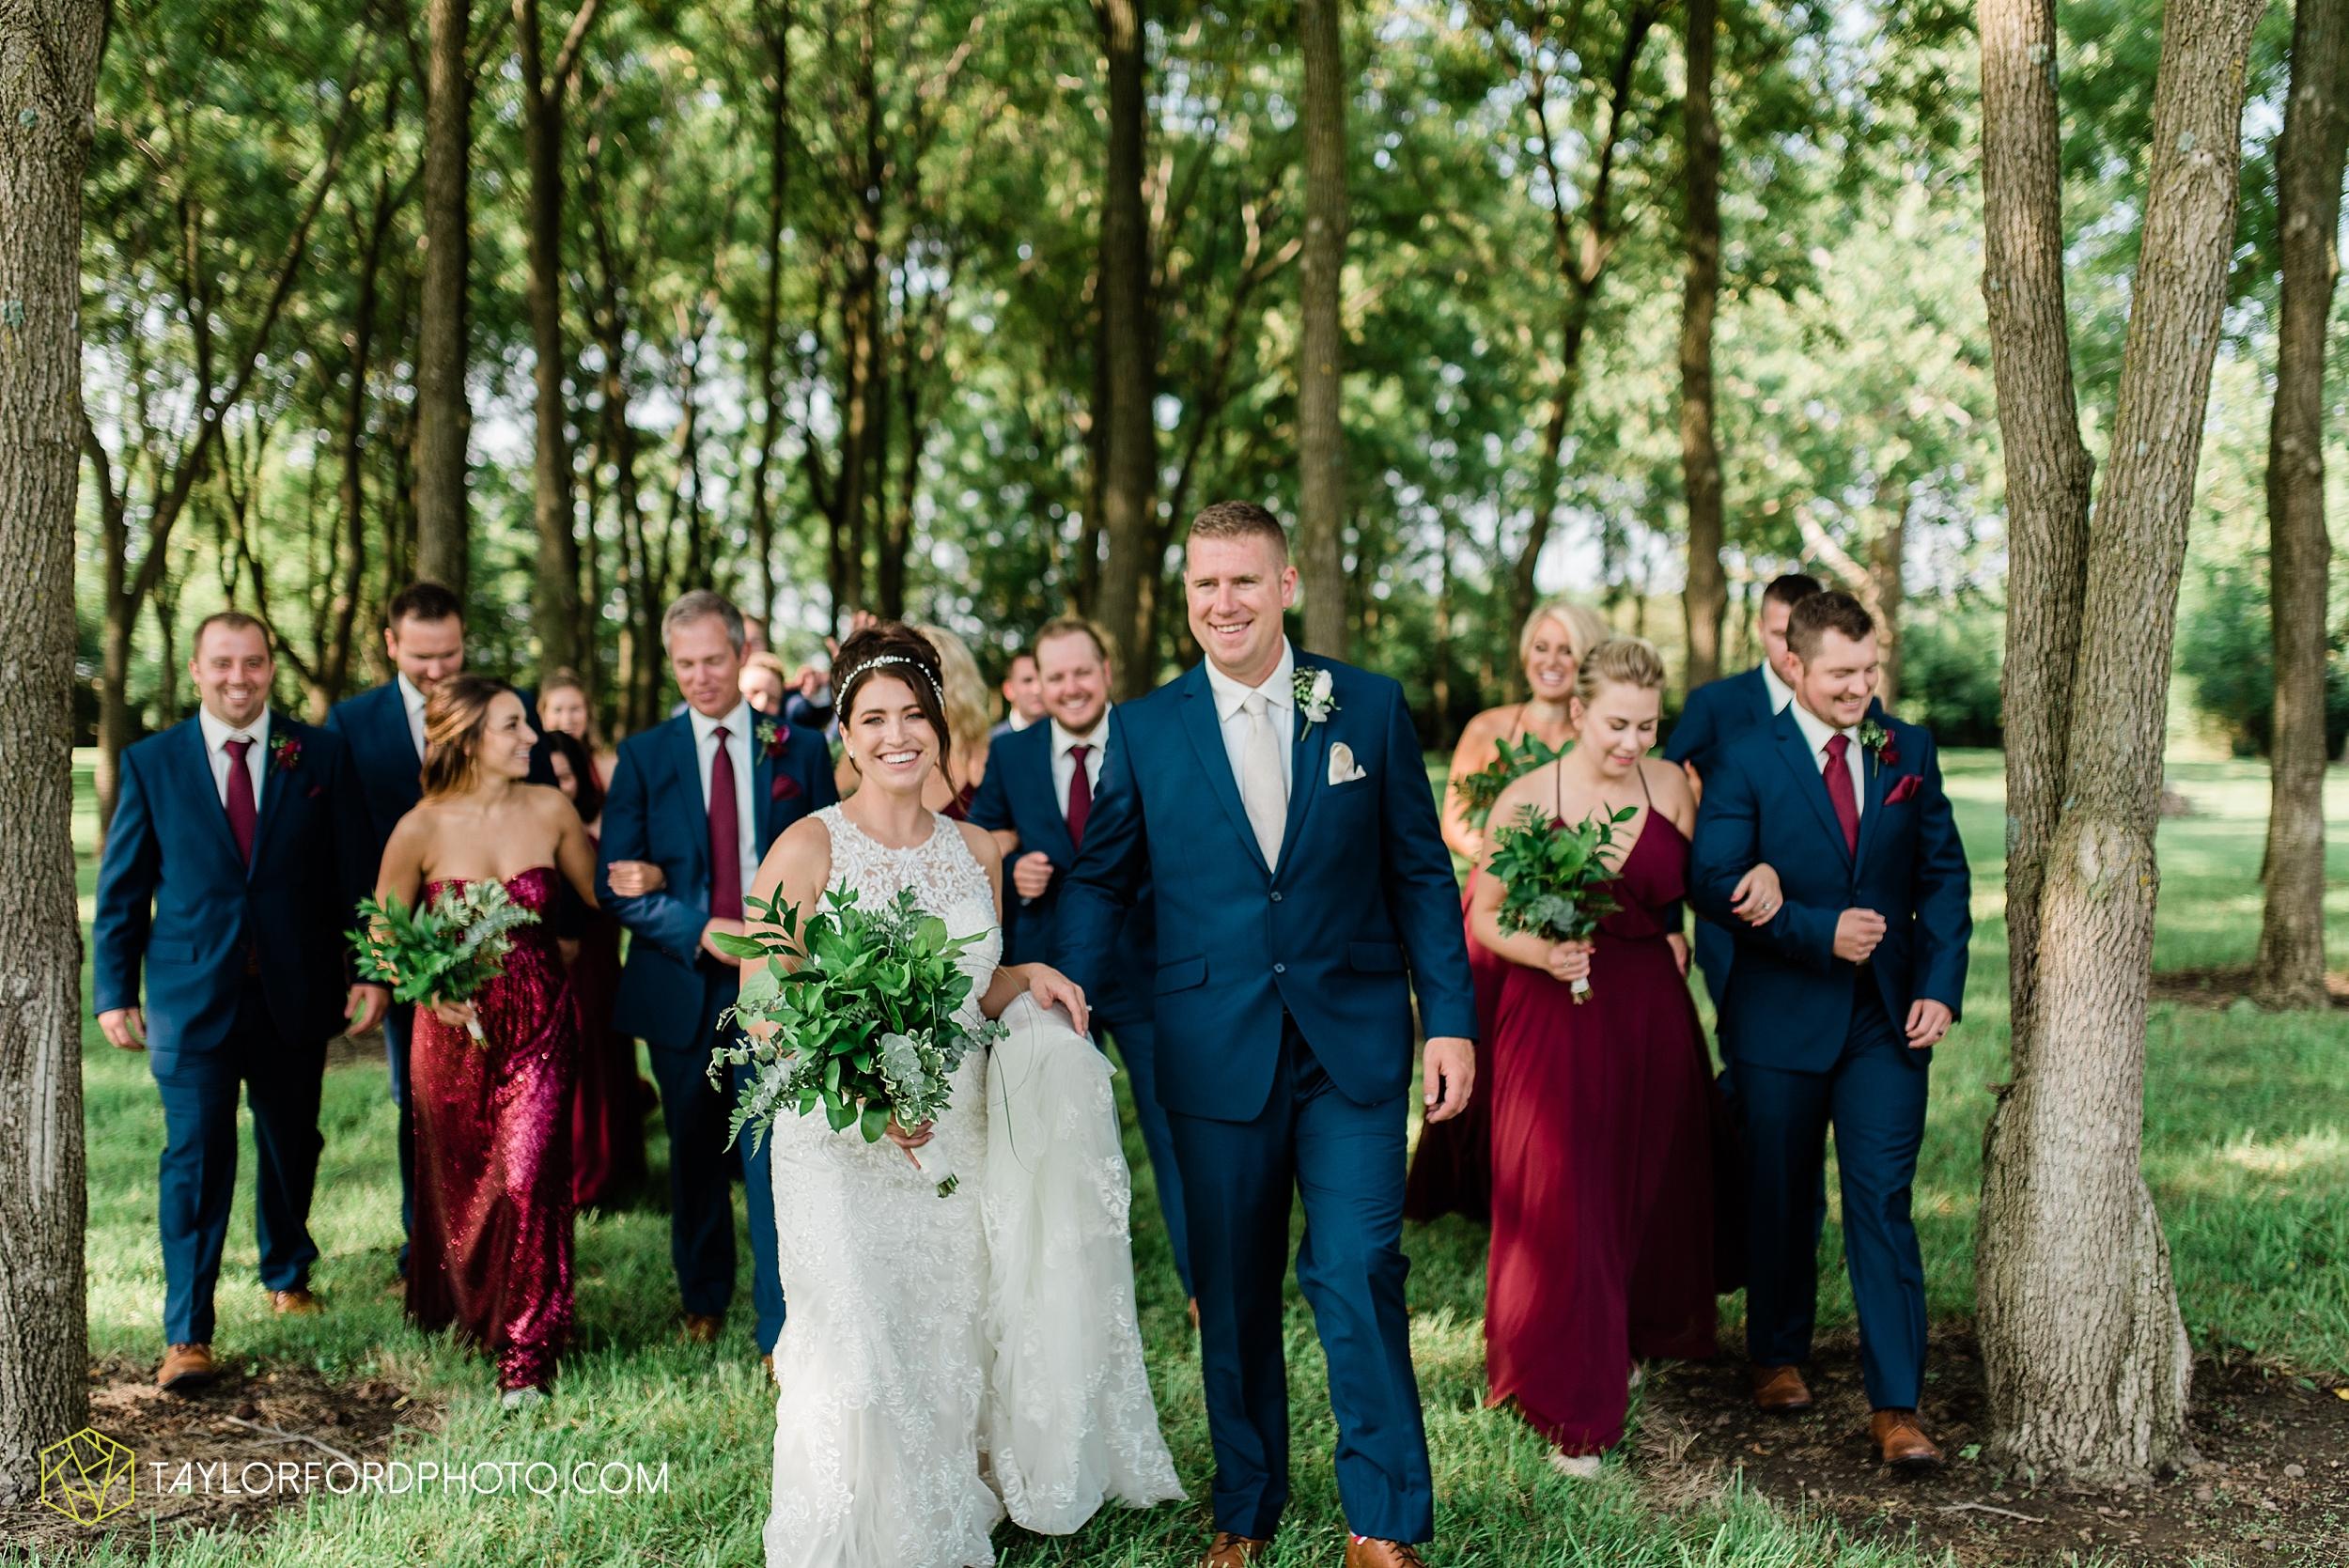 van-wert-ohio-first-united-methodist-church-county-dairy-barn-wedding-photographer-taylor-ford-photography_9844.jpg